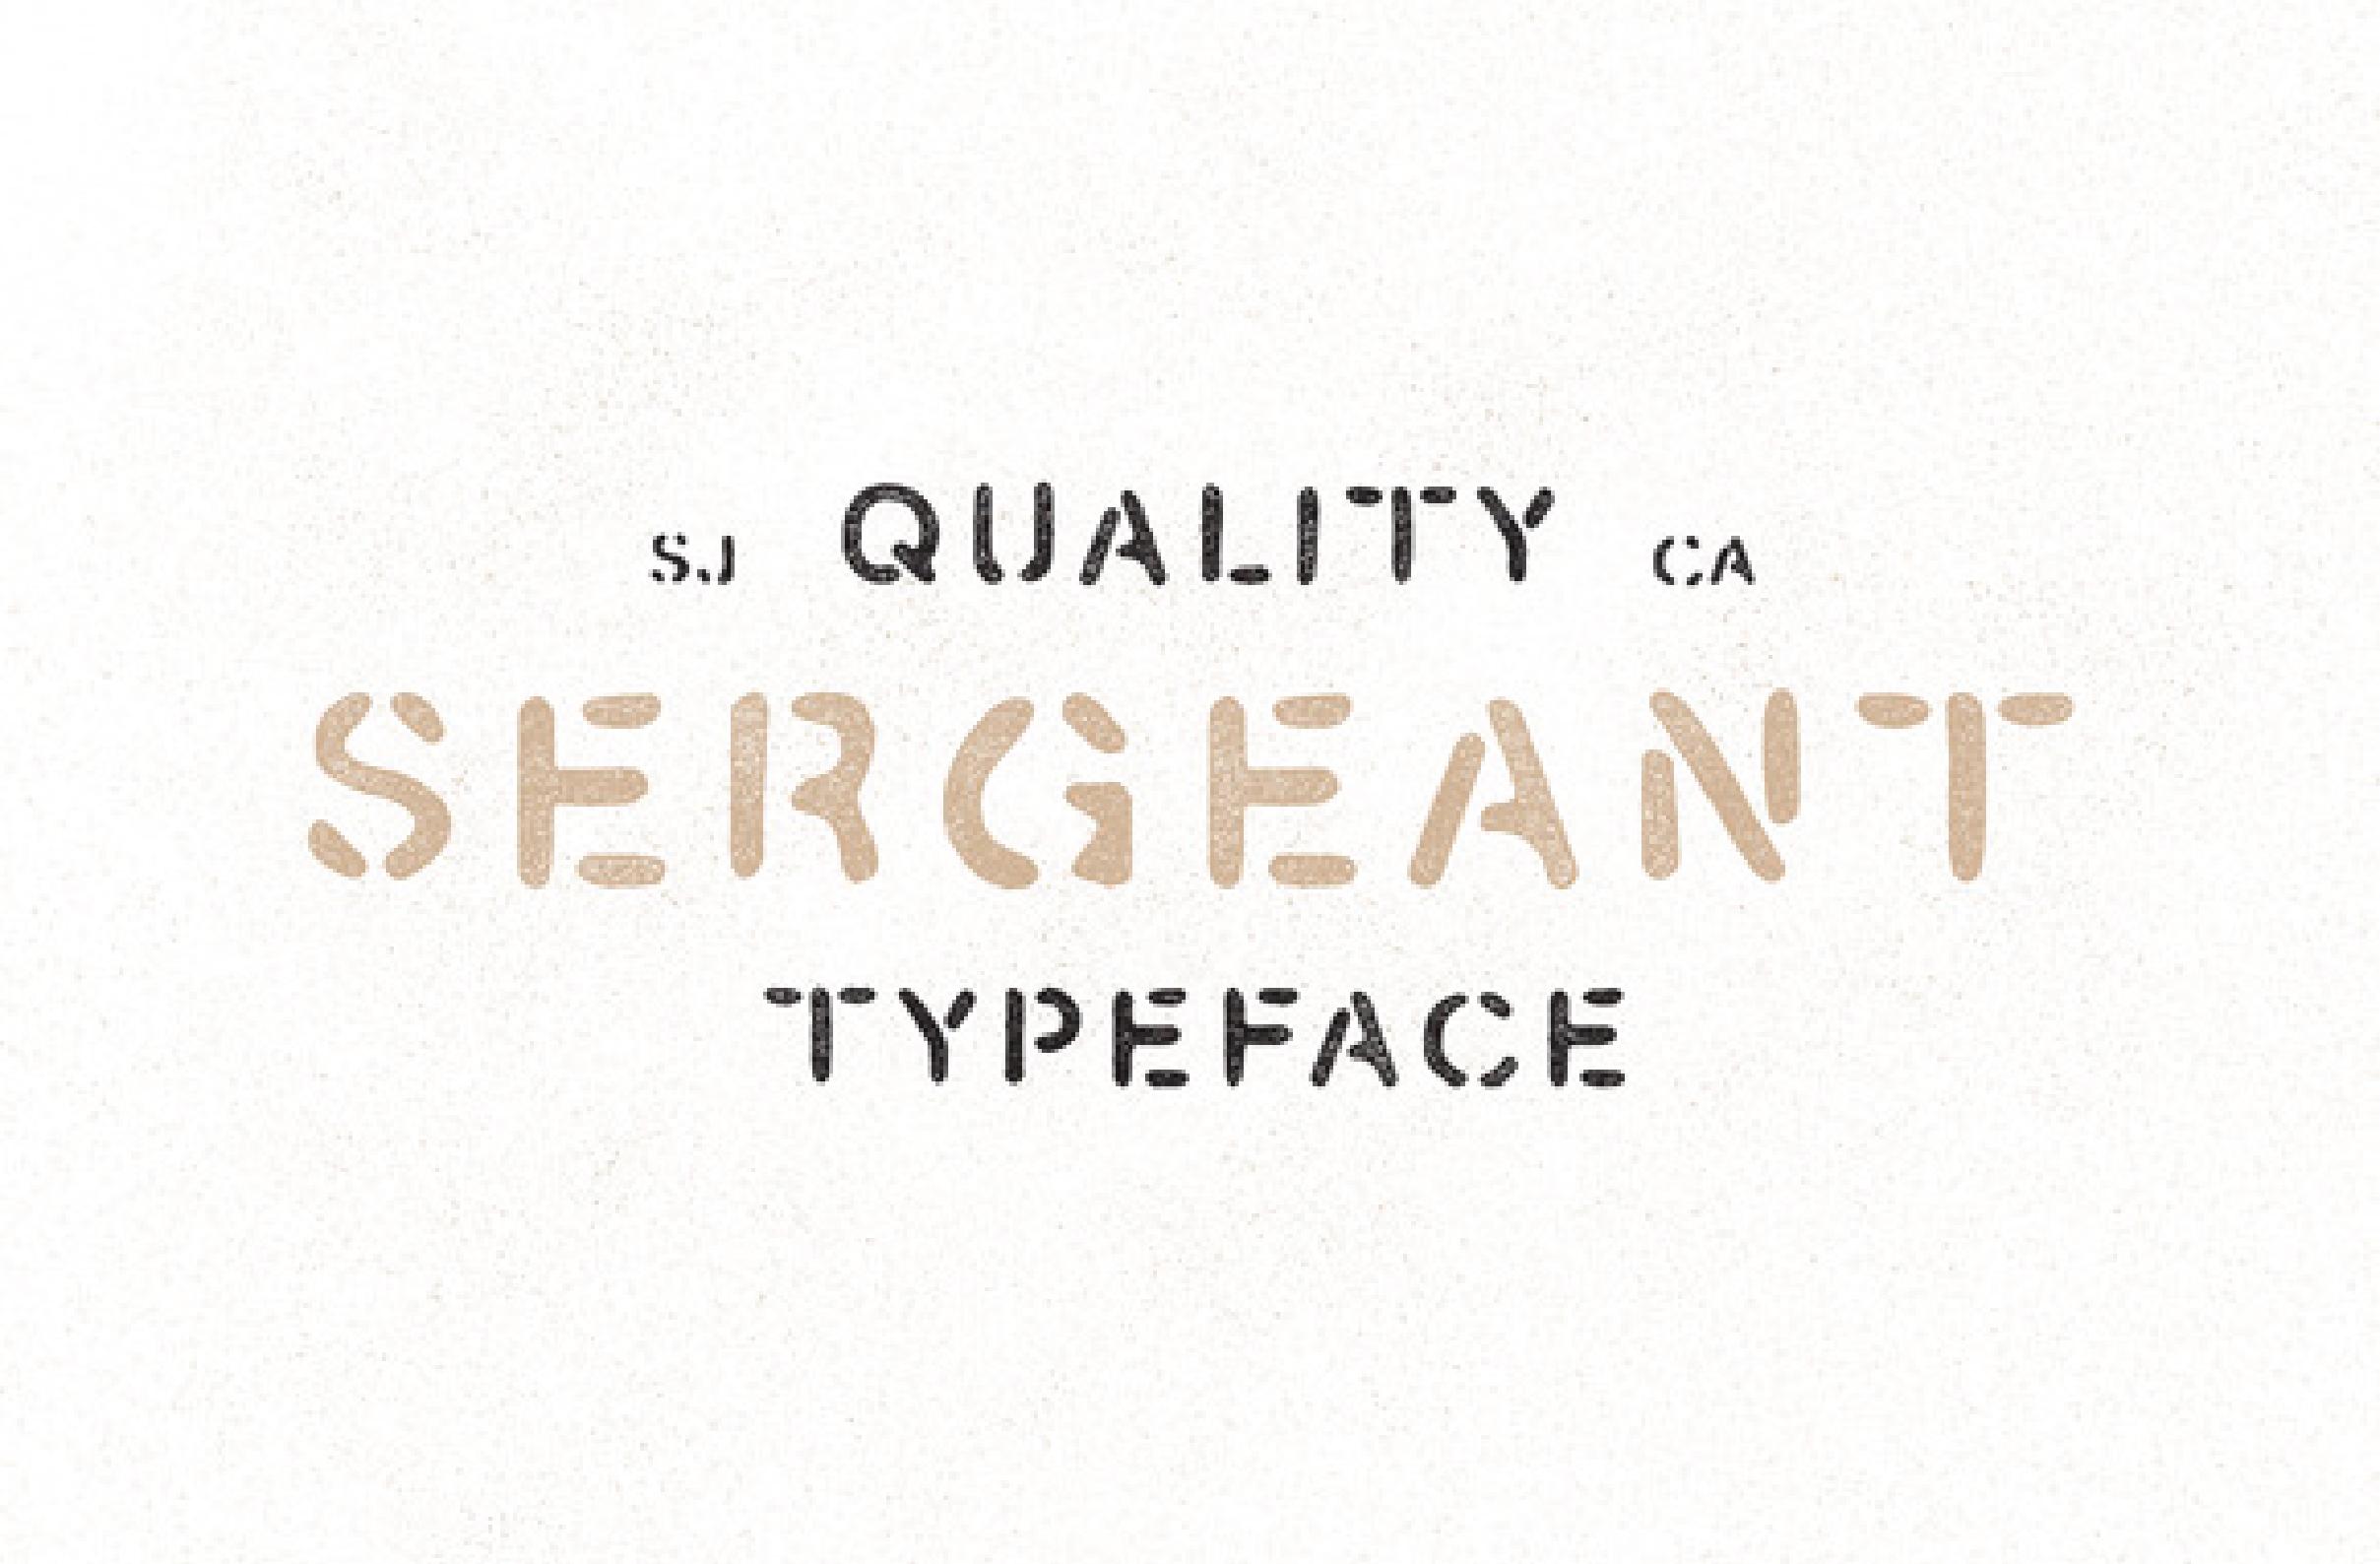 Sergeant Typeface